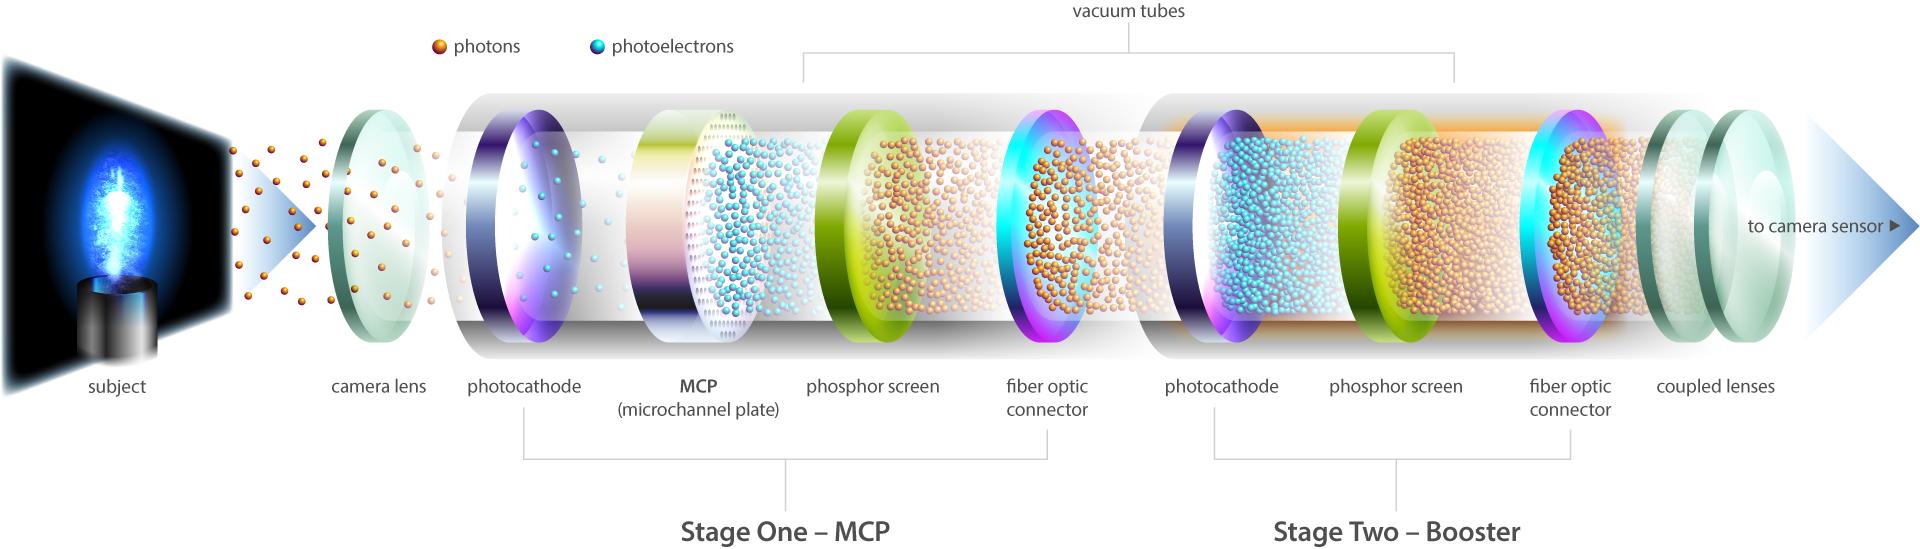 LaVision HighSpeed IRO X 2 stage image intensifier illustration.